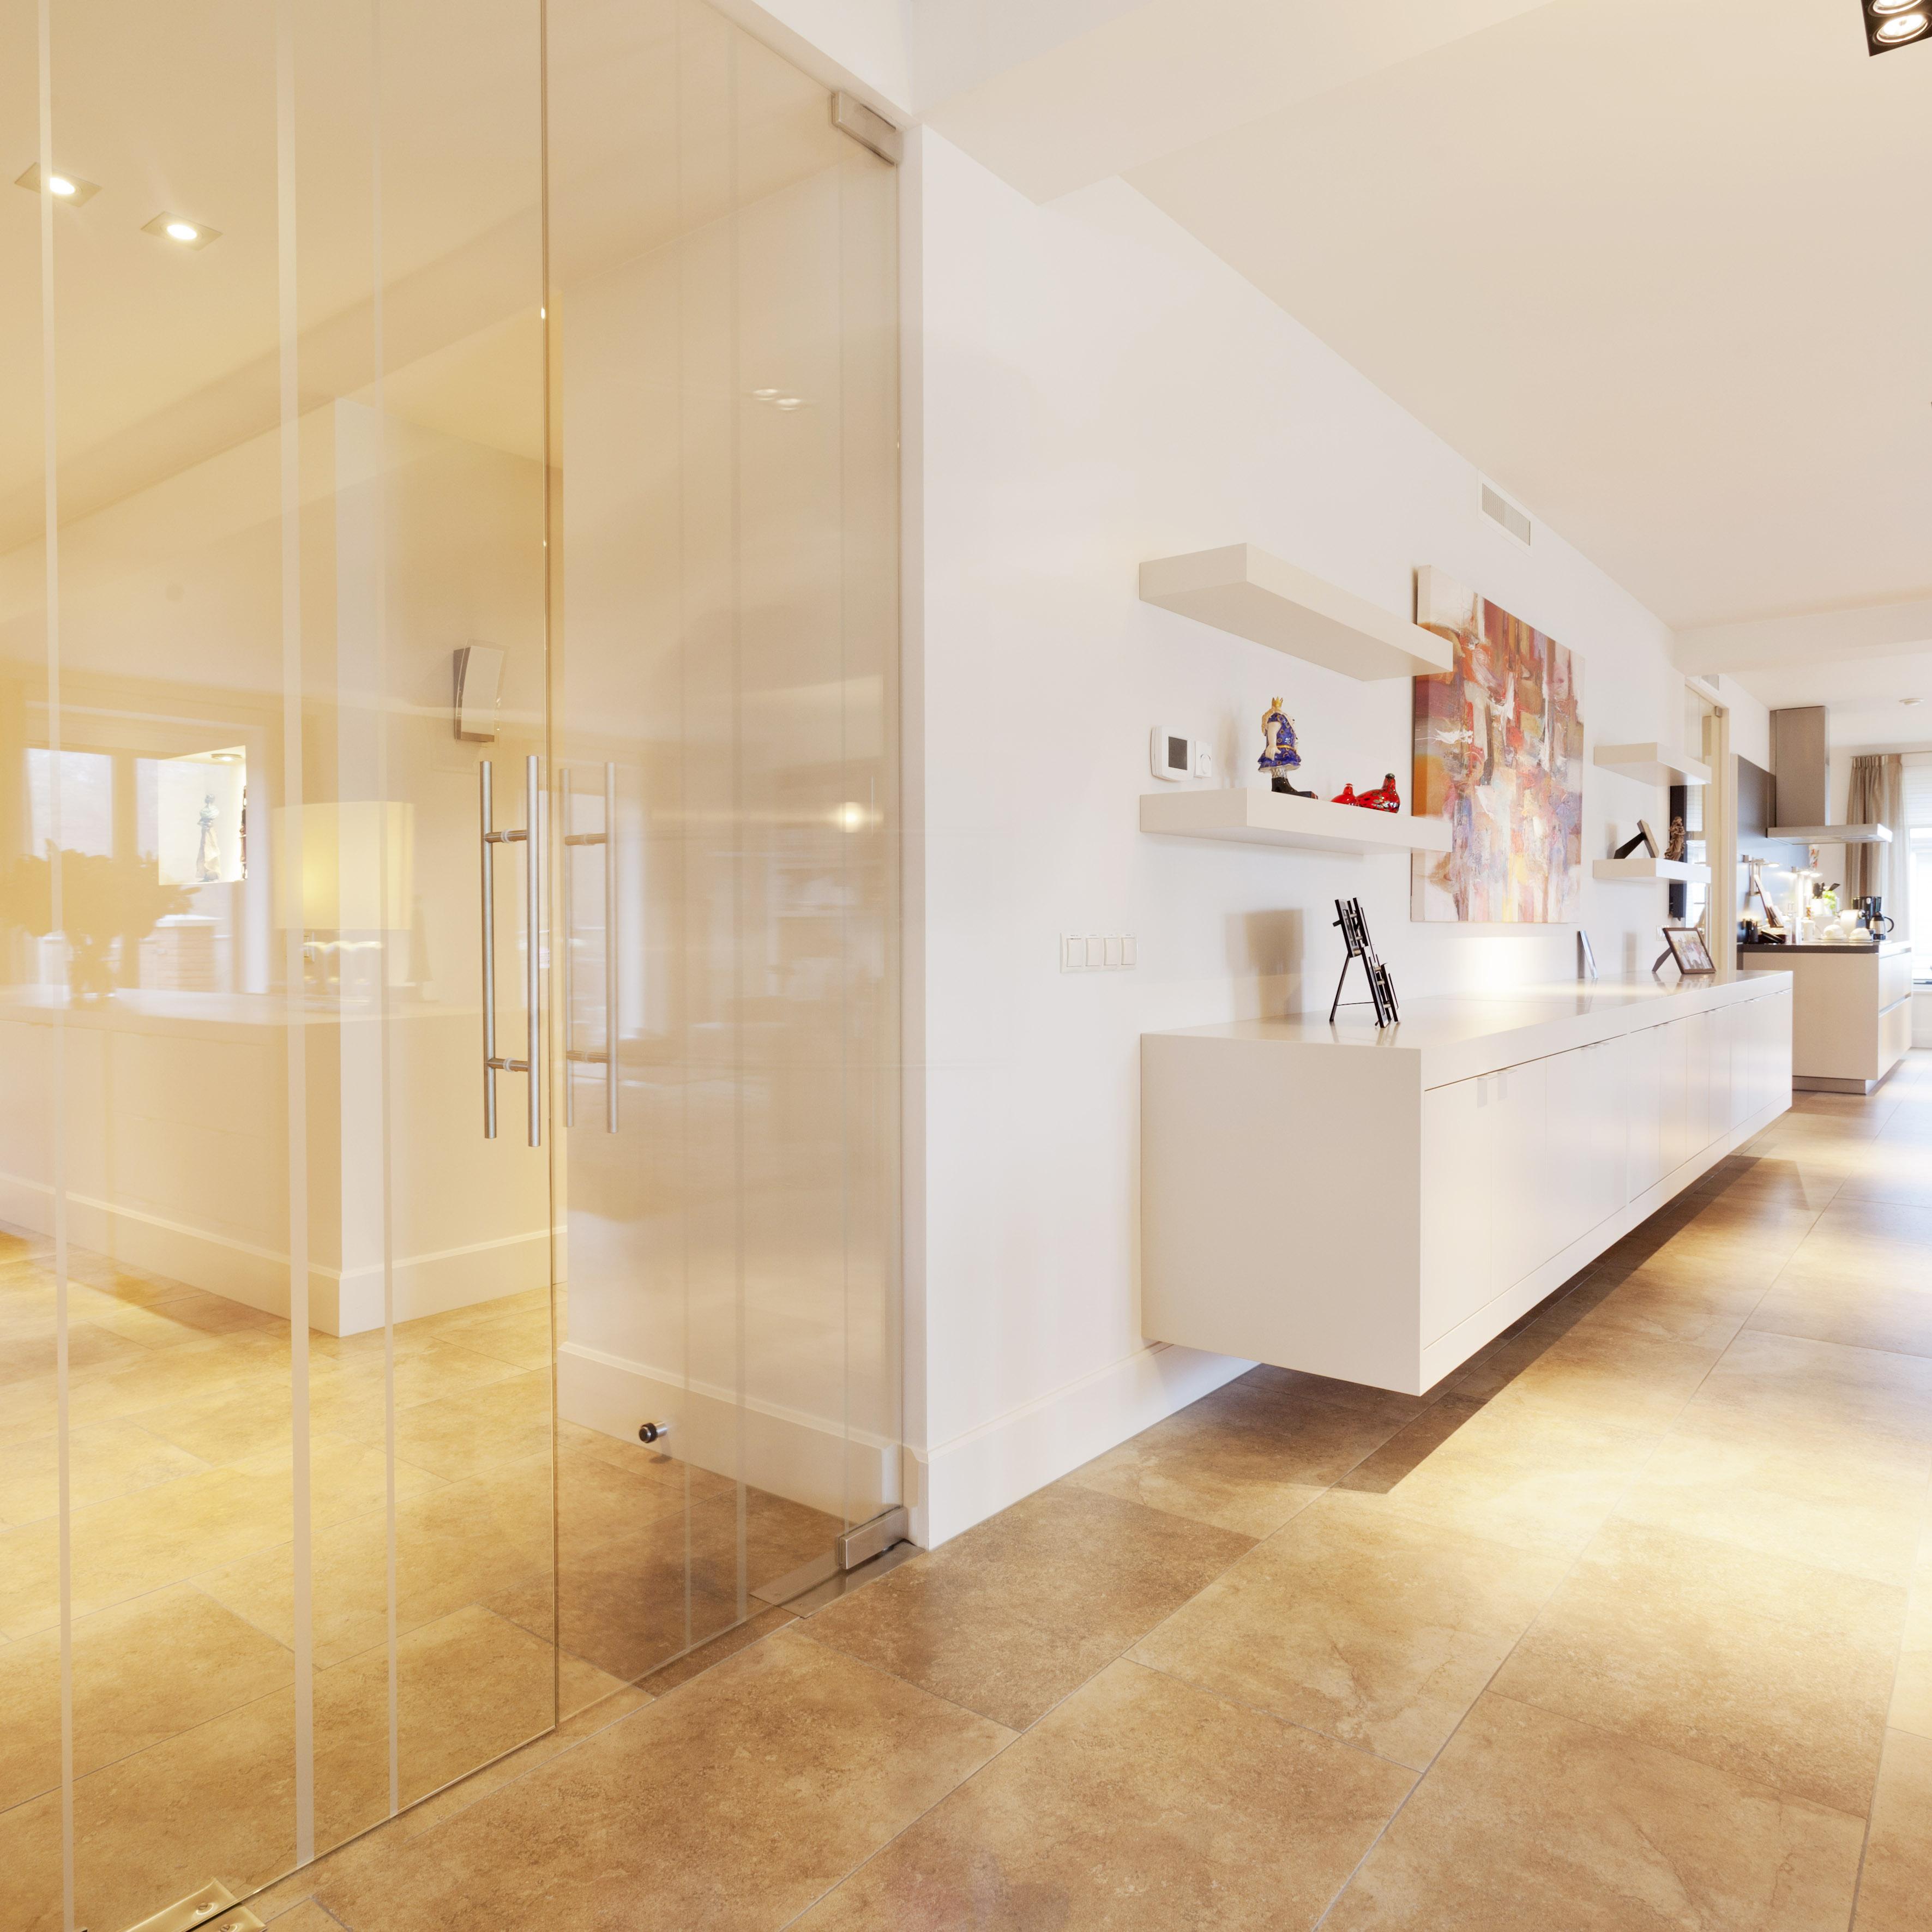 Dubbel penthouse — annekoos littel interieurarchitecten